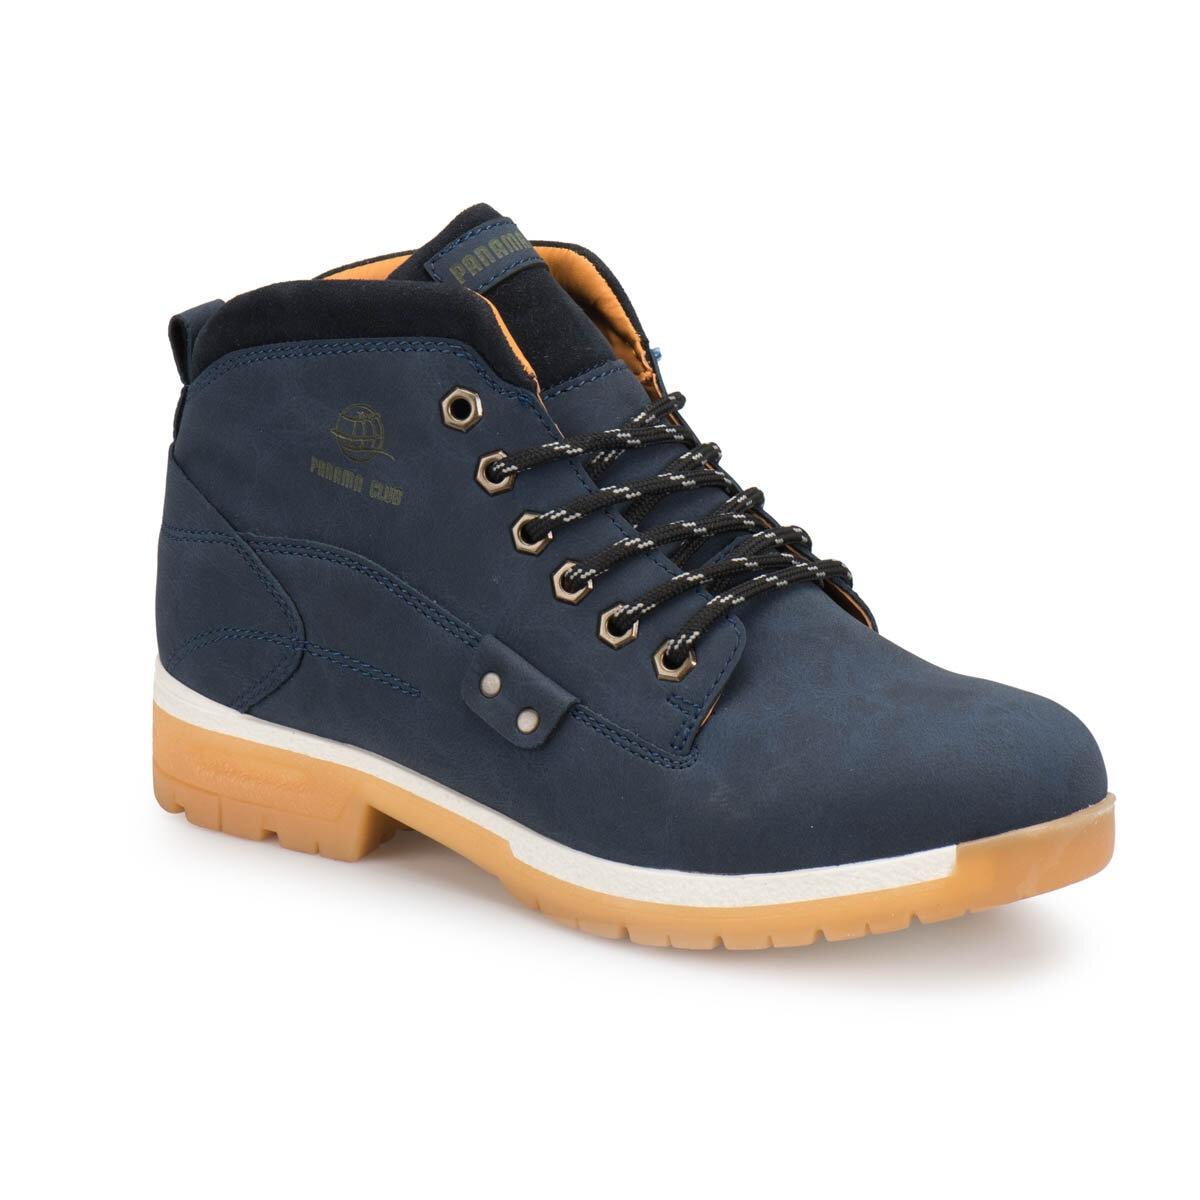 FLO 594 Navy Blue Men 'S Boots Panama Club